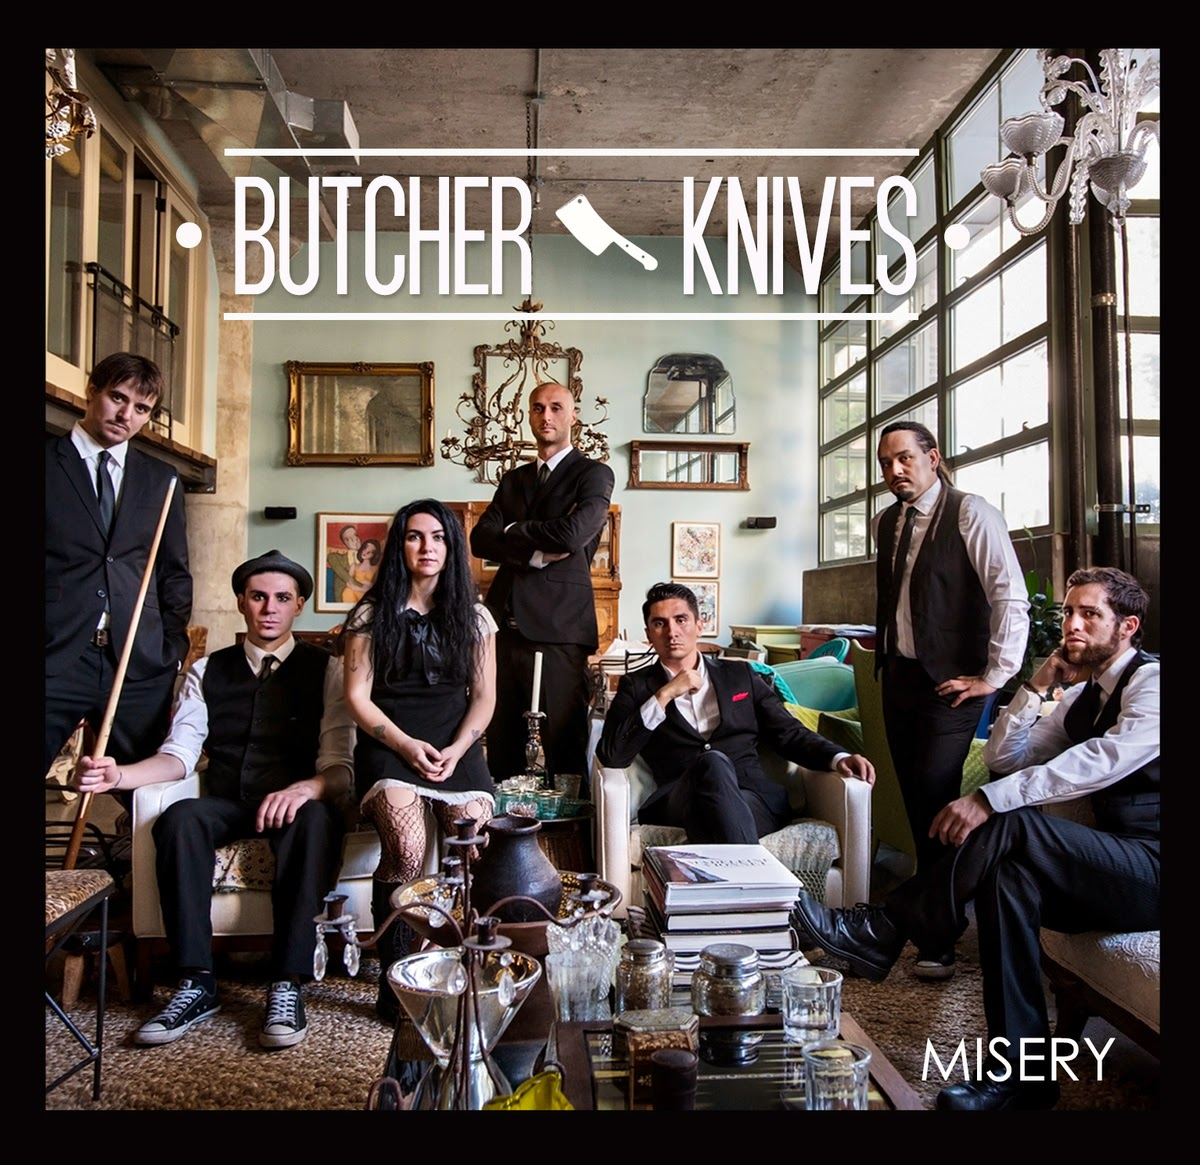 http://www.d4am.net/2014/04/butcher-knives-misery.html